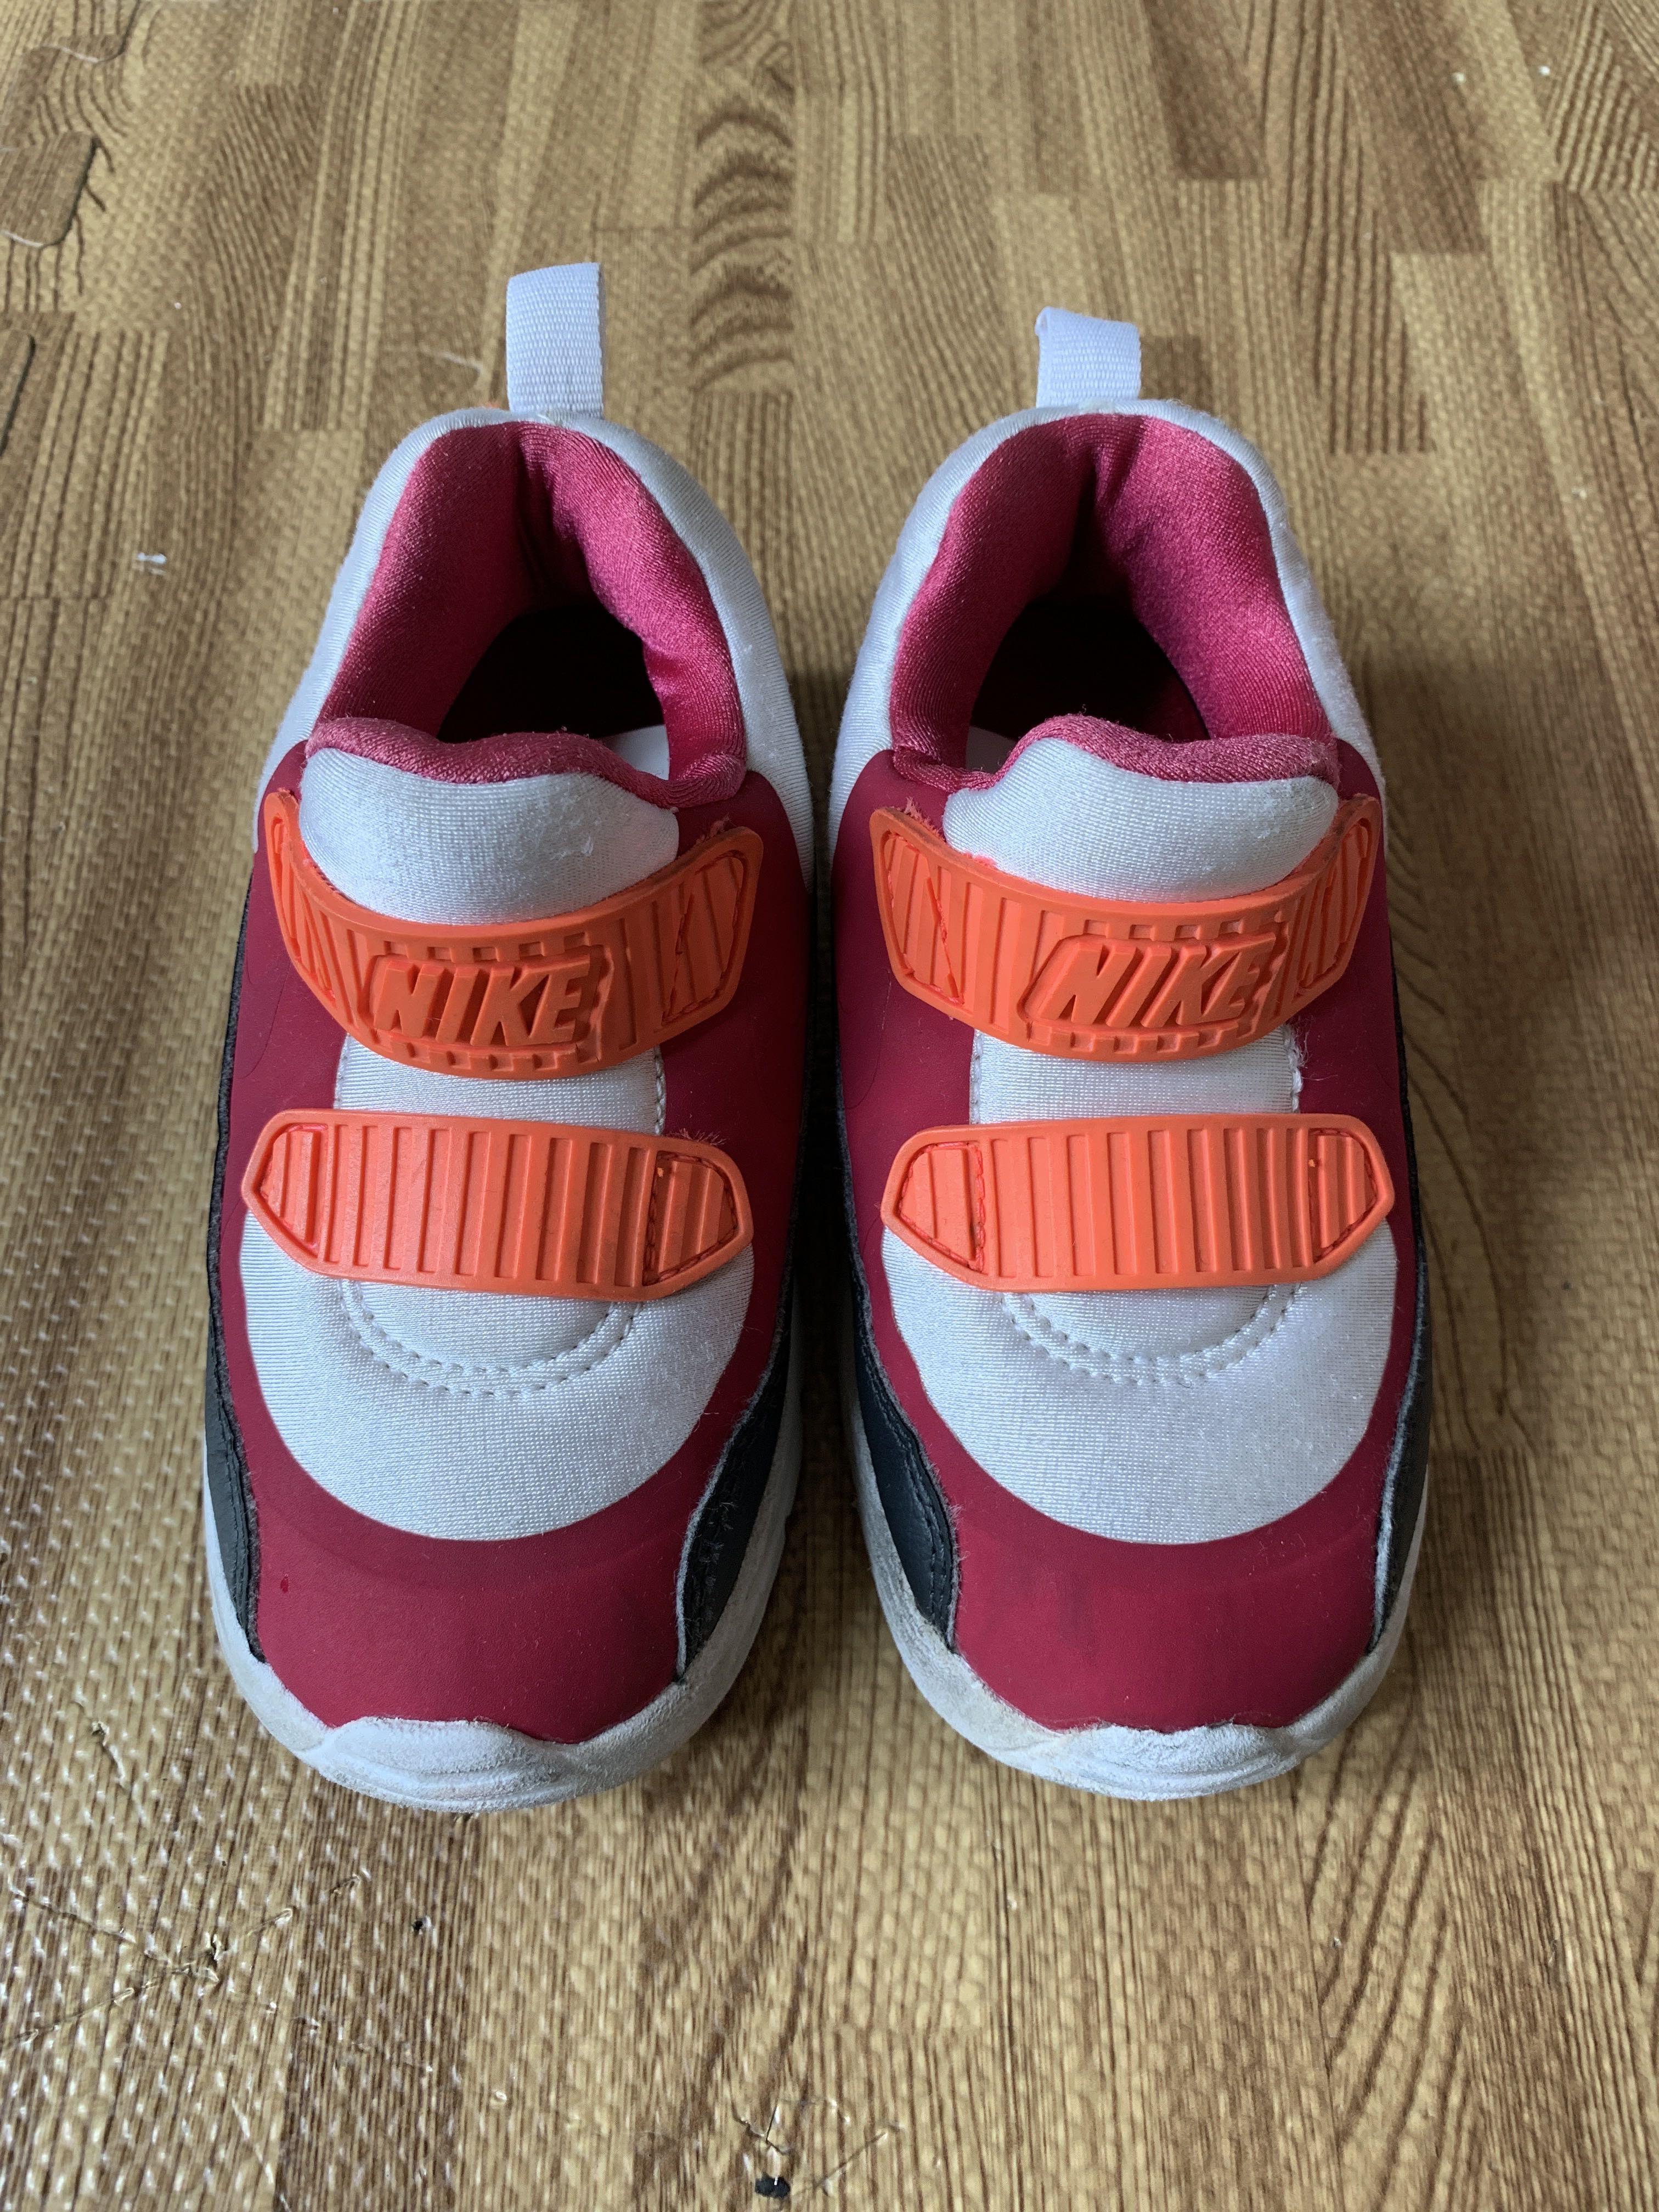 Nike air max 童鞋(15cm)